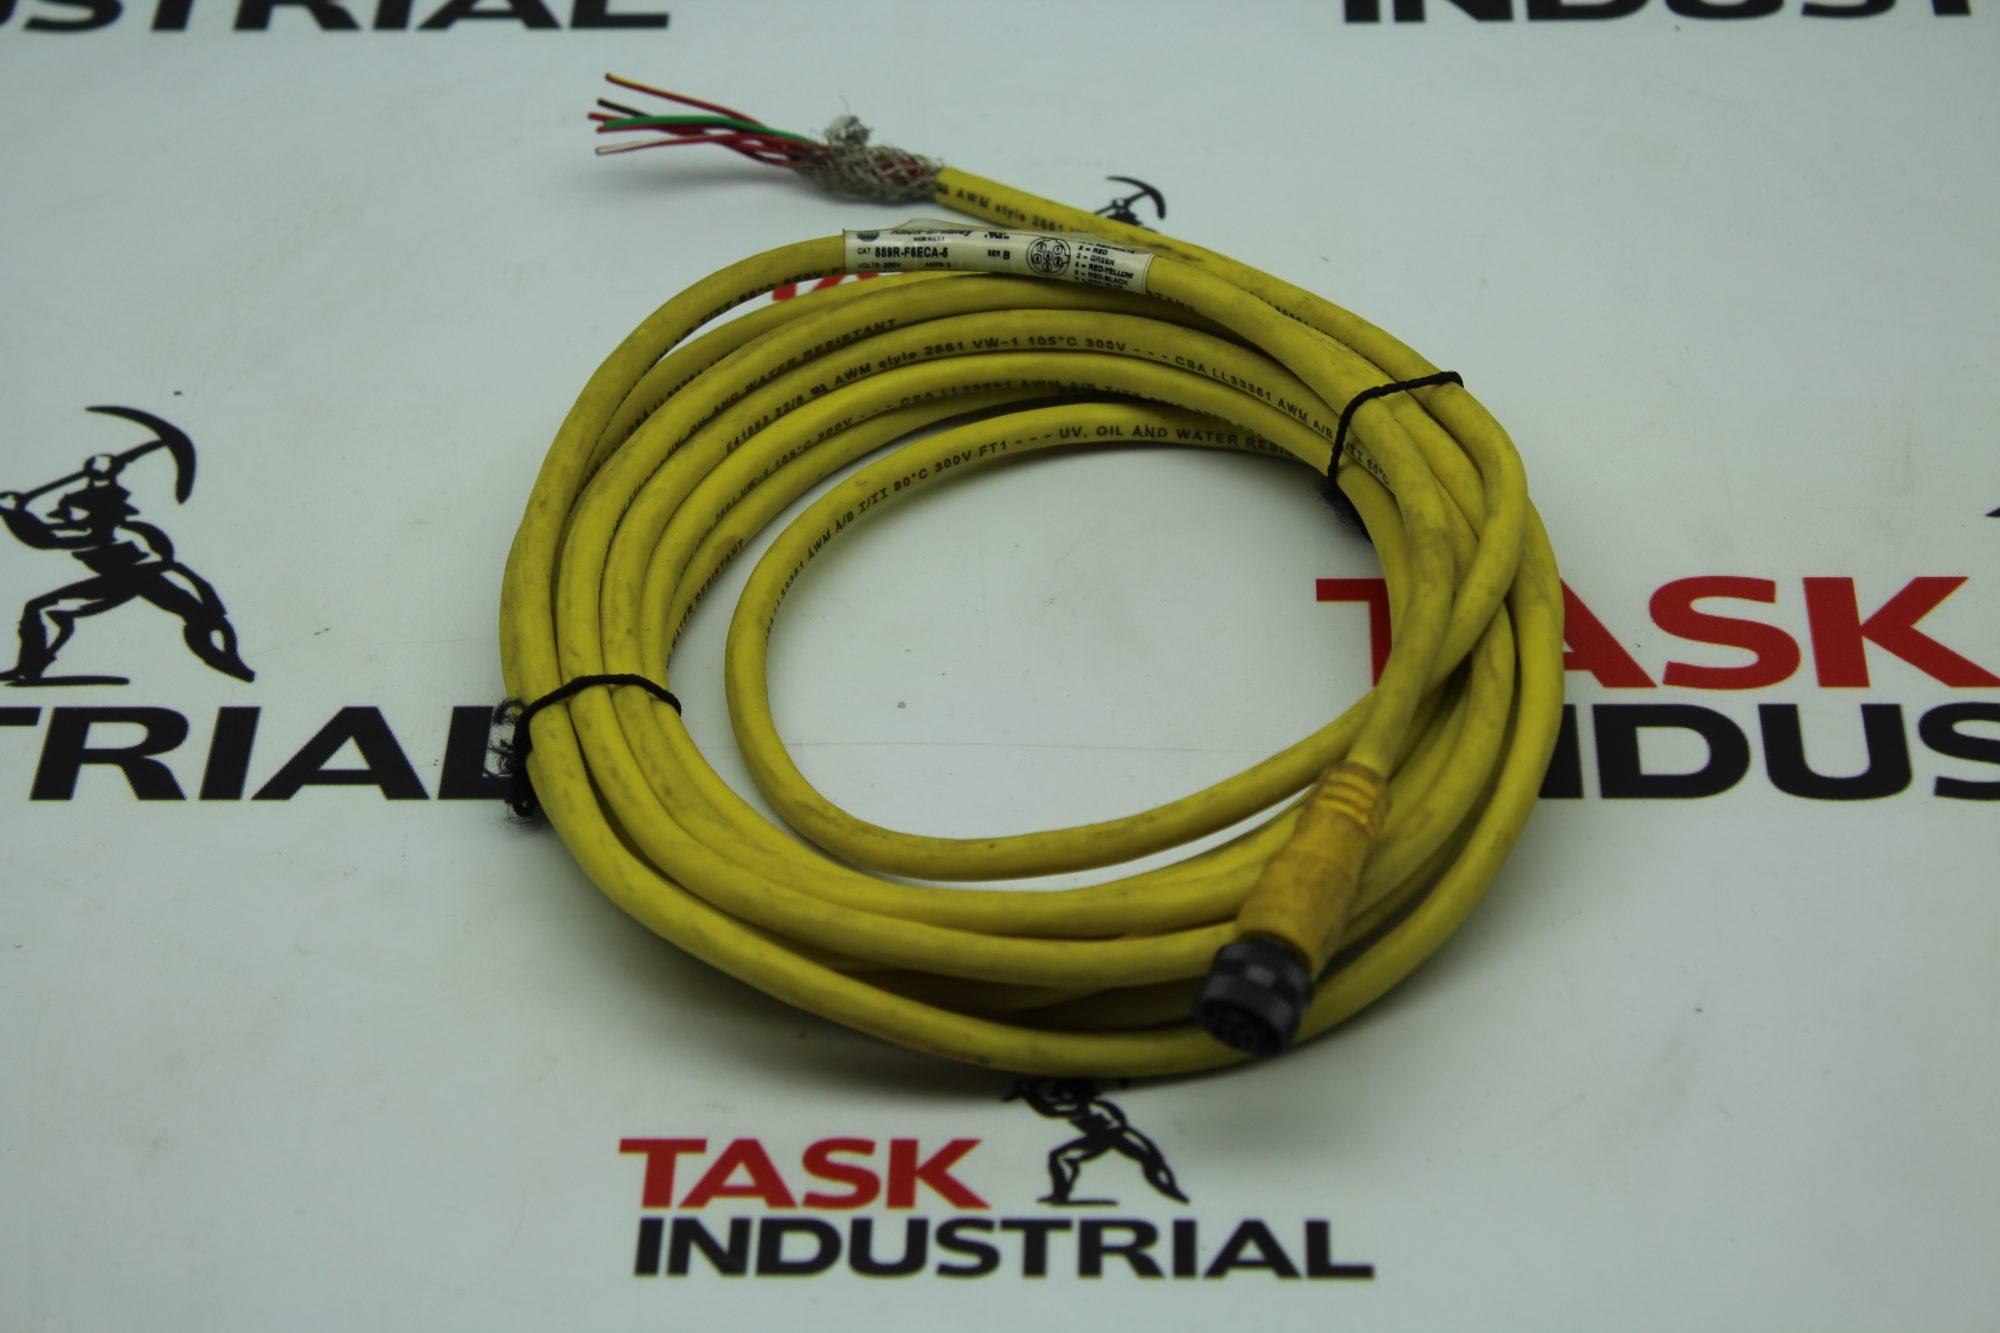 Allen-Bradley CAT 889R-F6ECA-5 Series B Cable